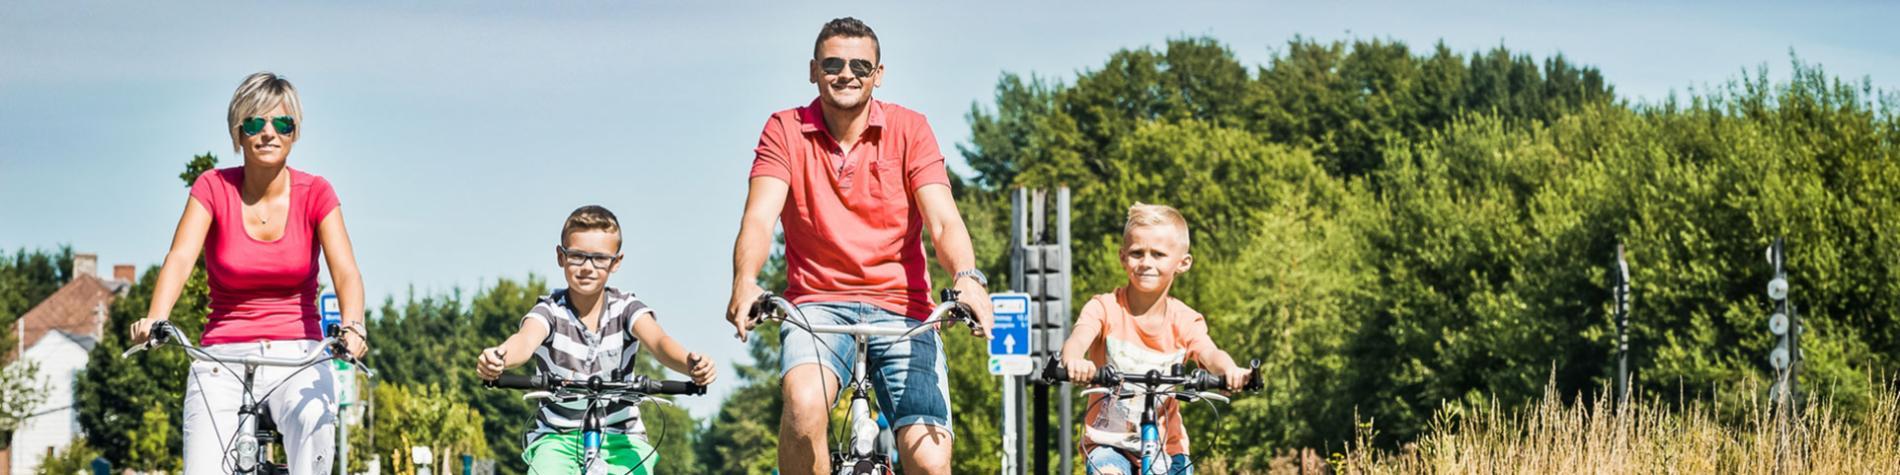 ravel vélo famille balade